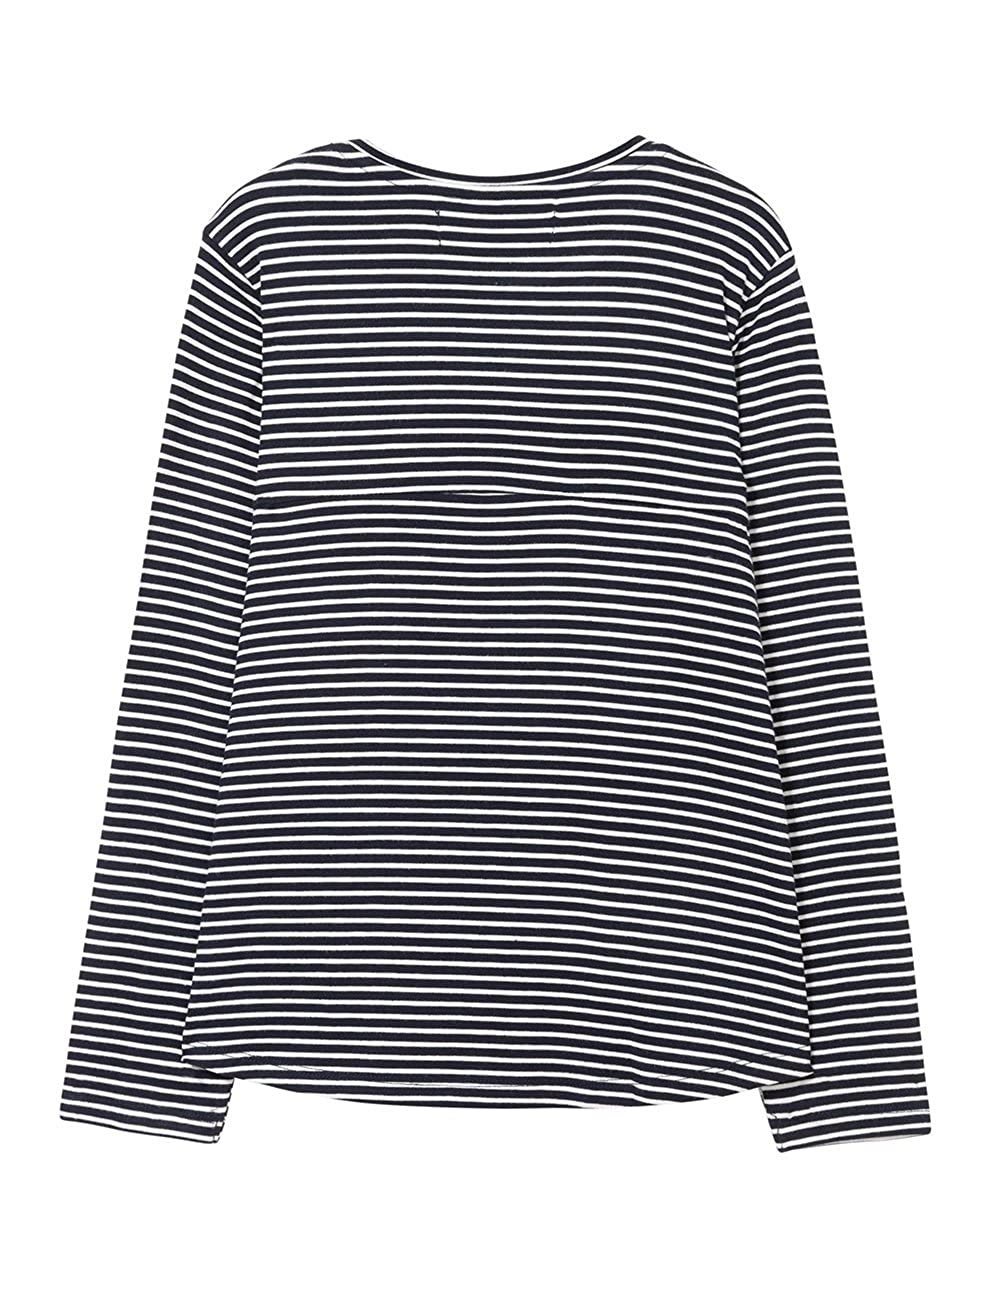 Desigual TS/_Washington T-Shirt Bambina